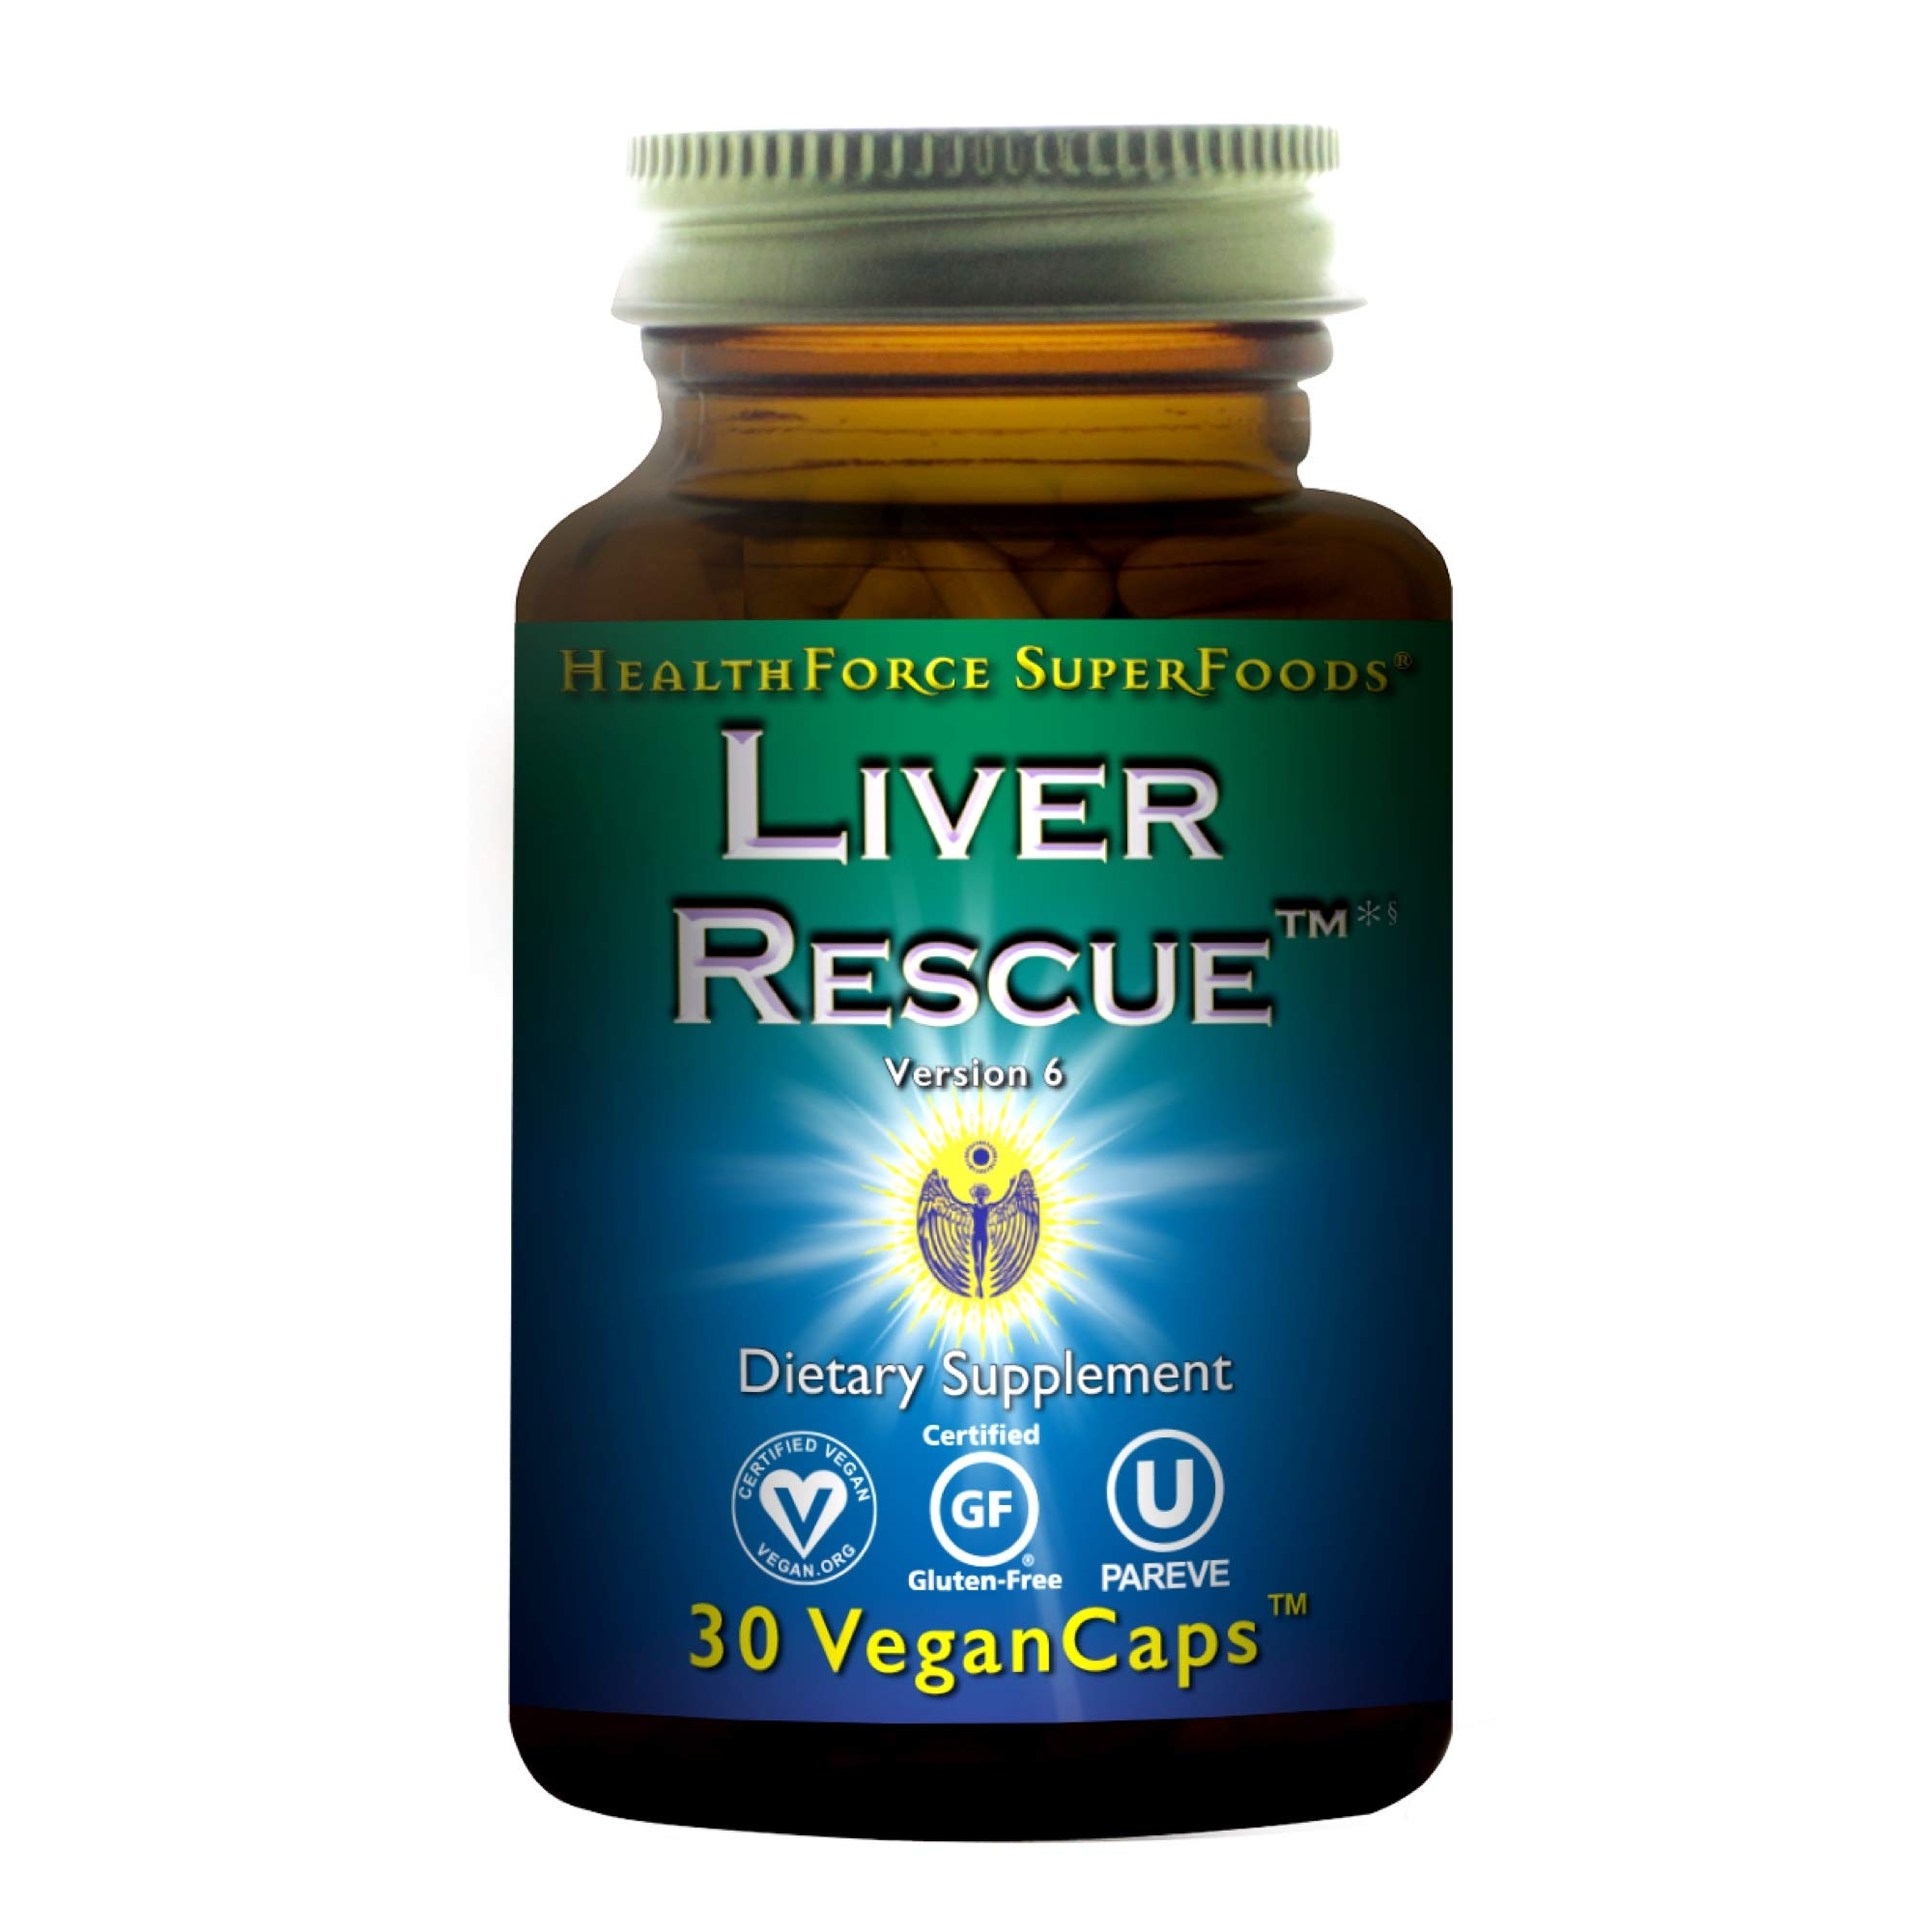 HealthForce SuperFoods Liver Rescue - 30 Count (Pack of 1) Vegan Capsules - All Natural Liver Detoxifier & Regenerator Supplement with Milk Thistle & Dandelion Root - Gluten Free - 15 Servings by Healthforce